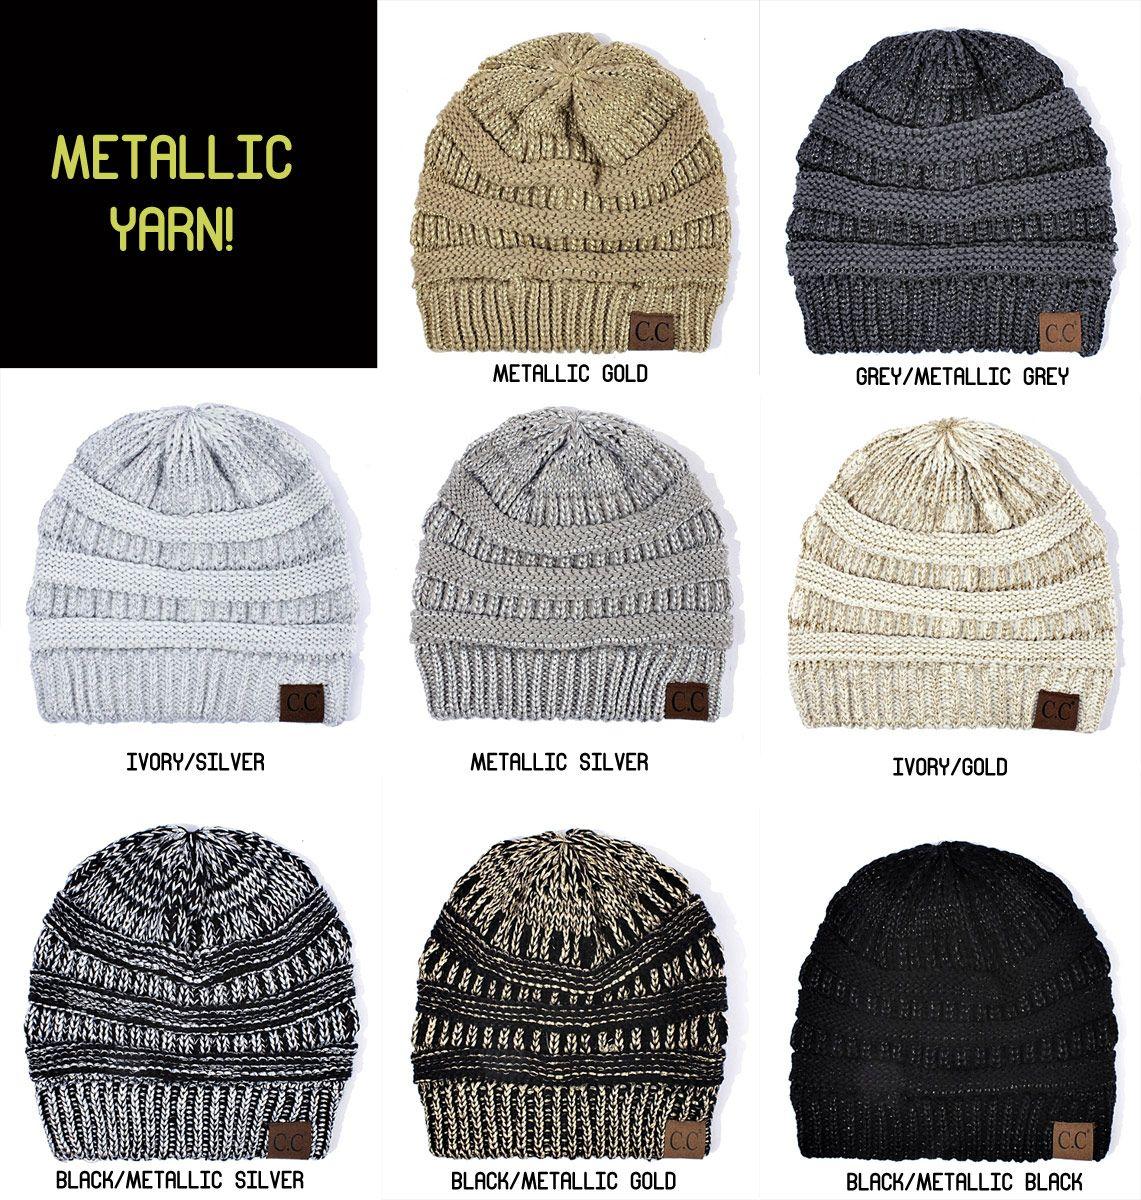 9ee6300183e3b Metallic Yarn Knit CC Beanie Hat inset 3